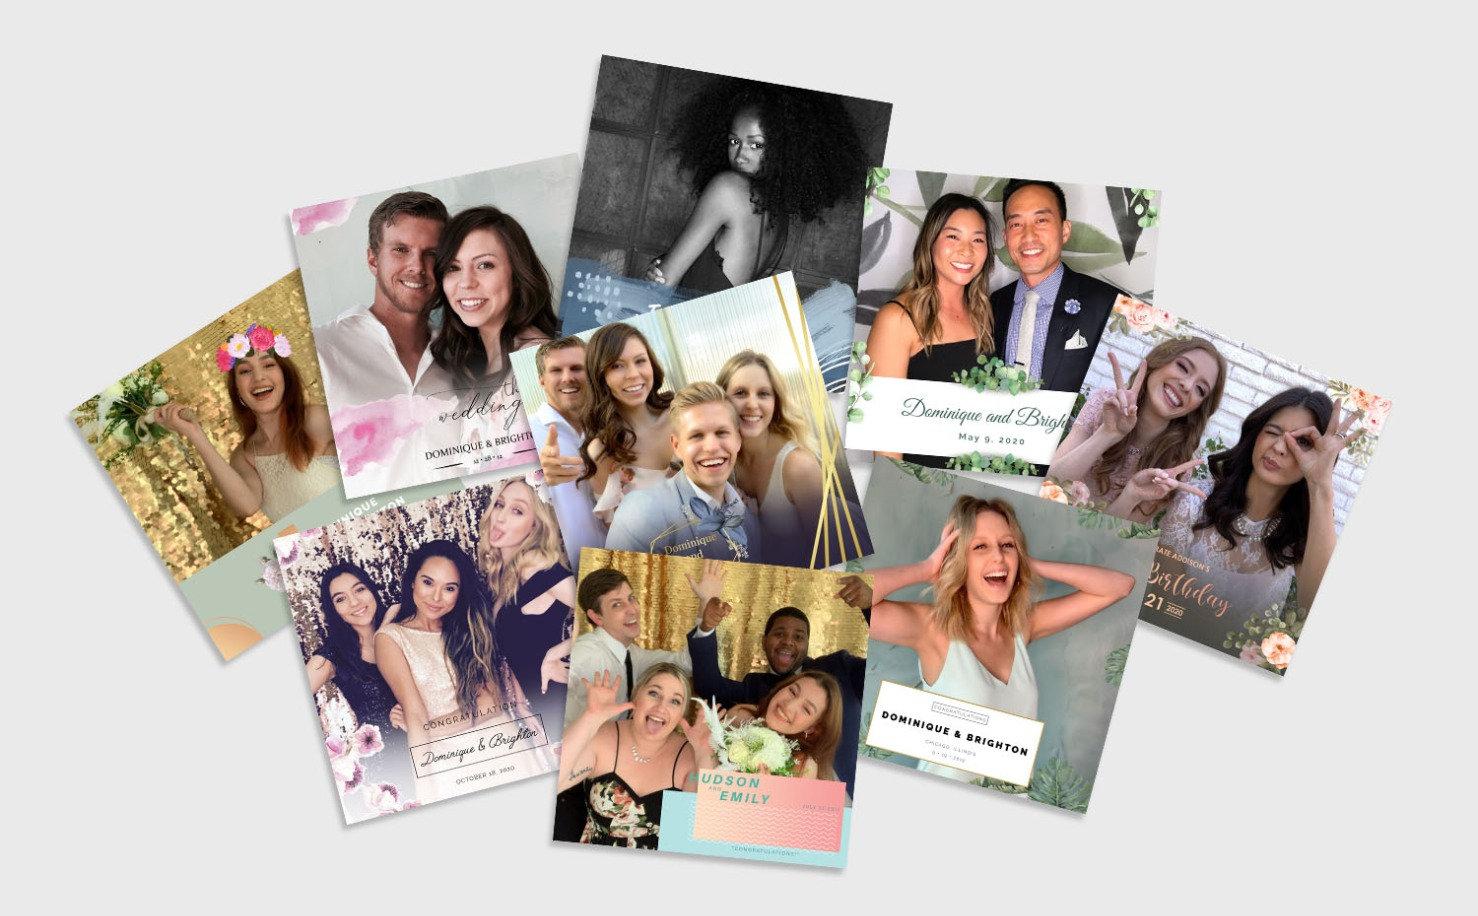 Virtual Photo Booth Coming Soon!